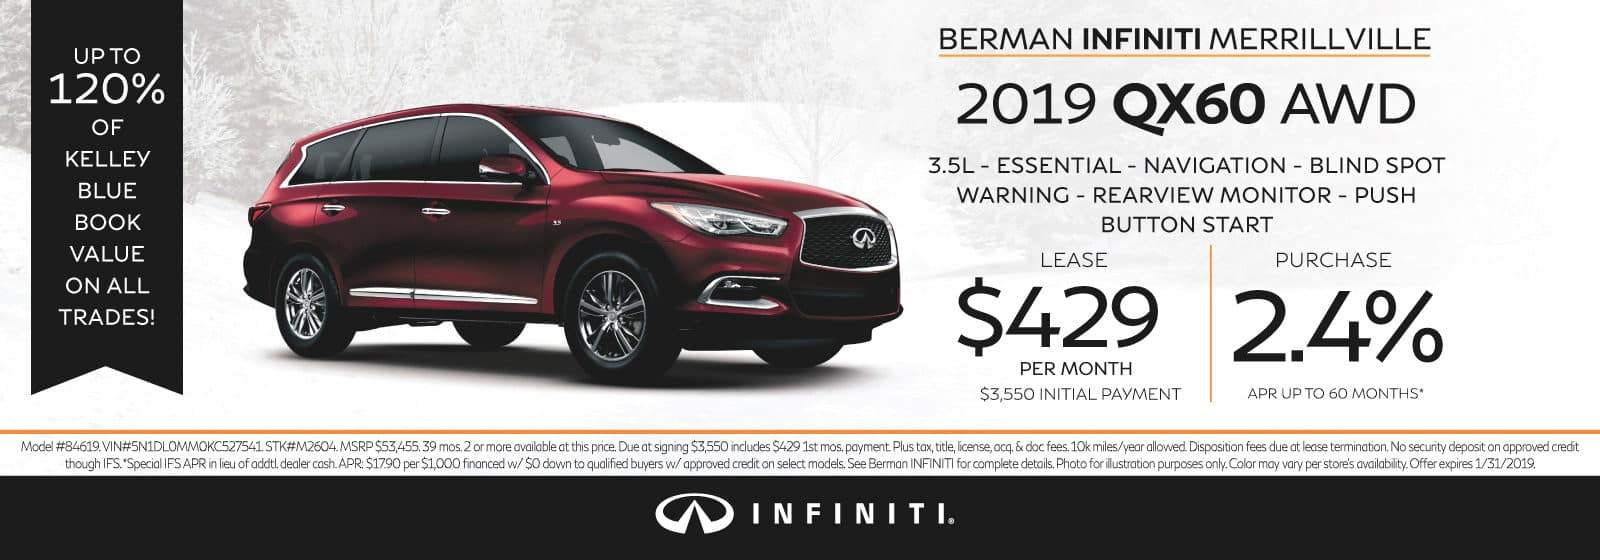 New 2019 INFINITI QX60 January Offer at Berman INFINITI of Merrillville!